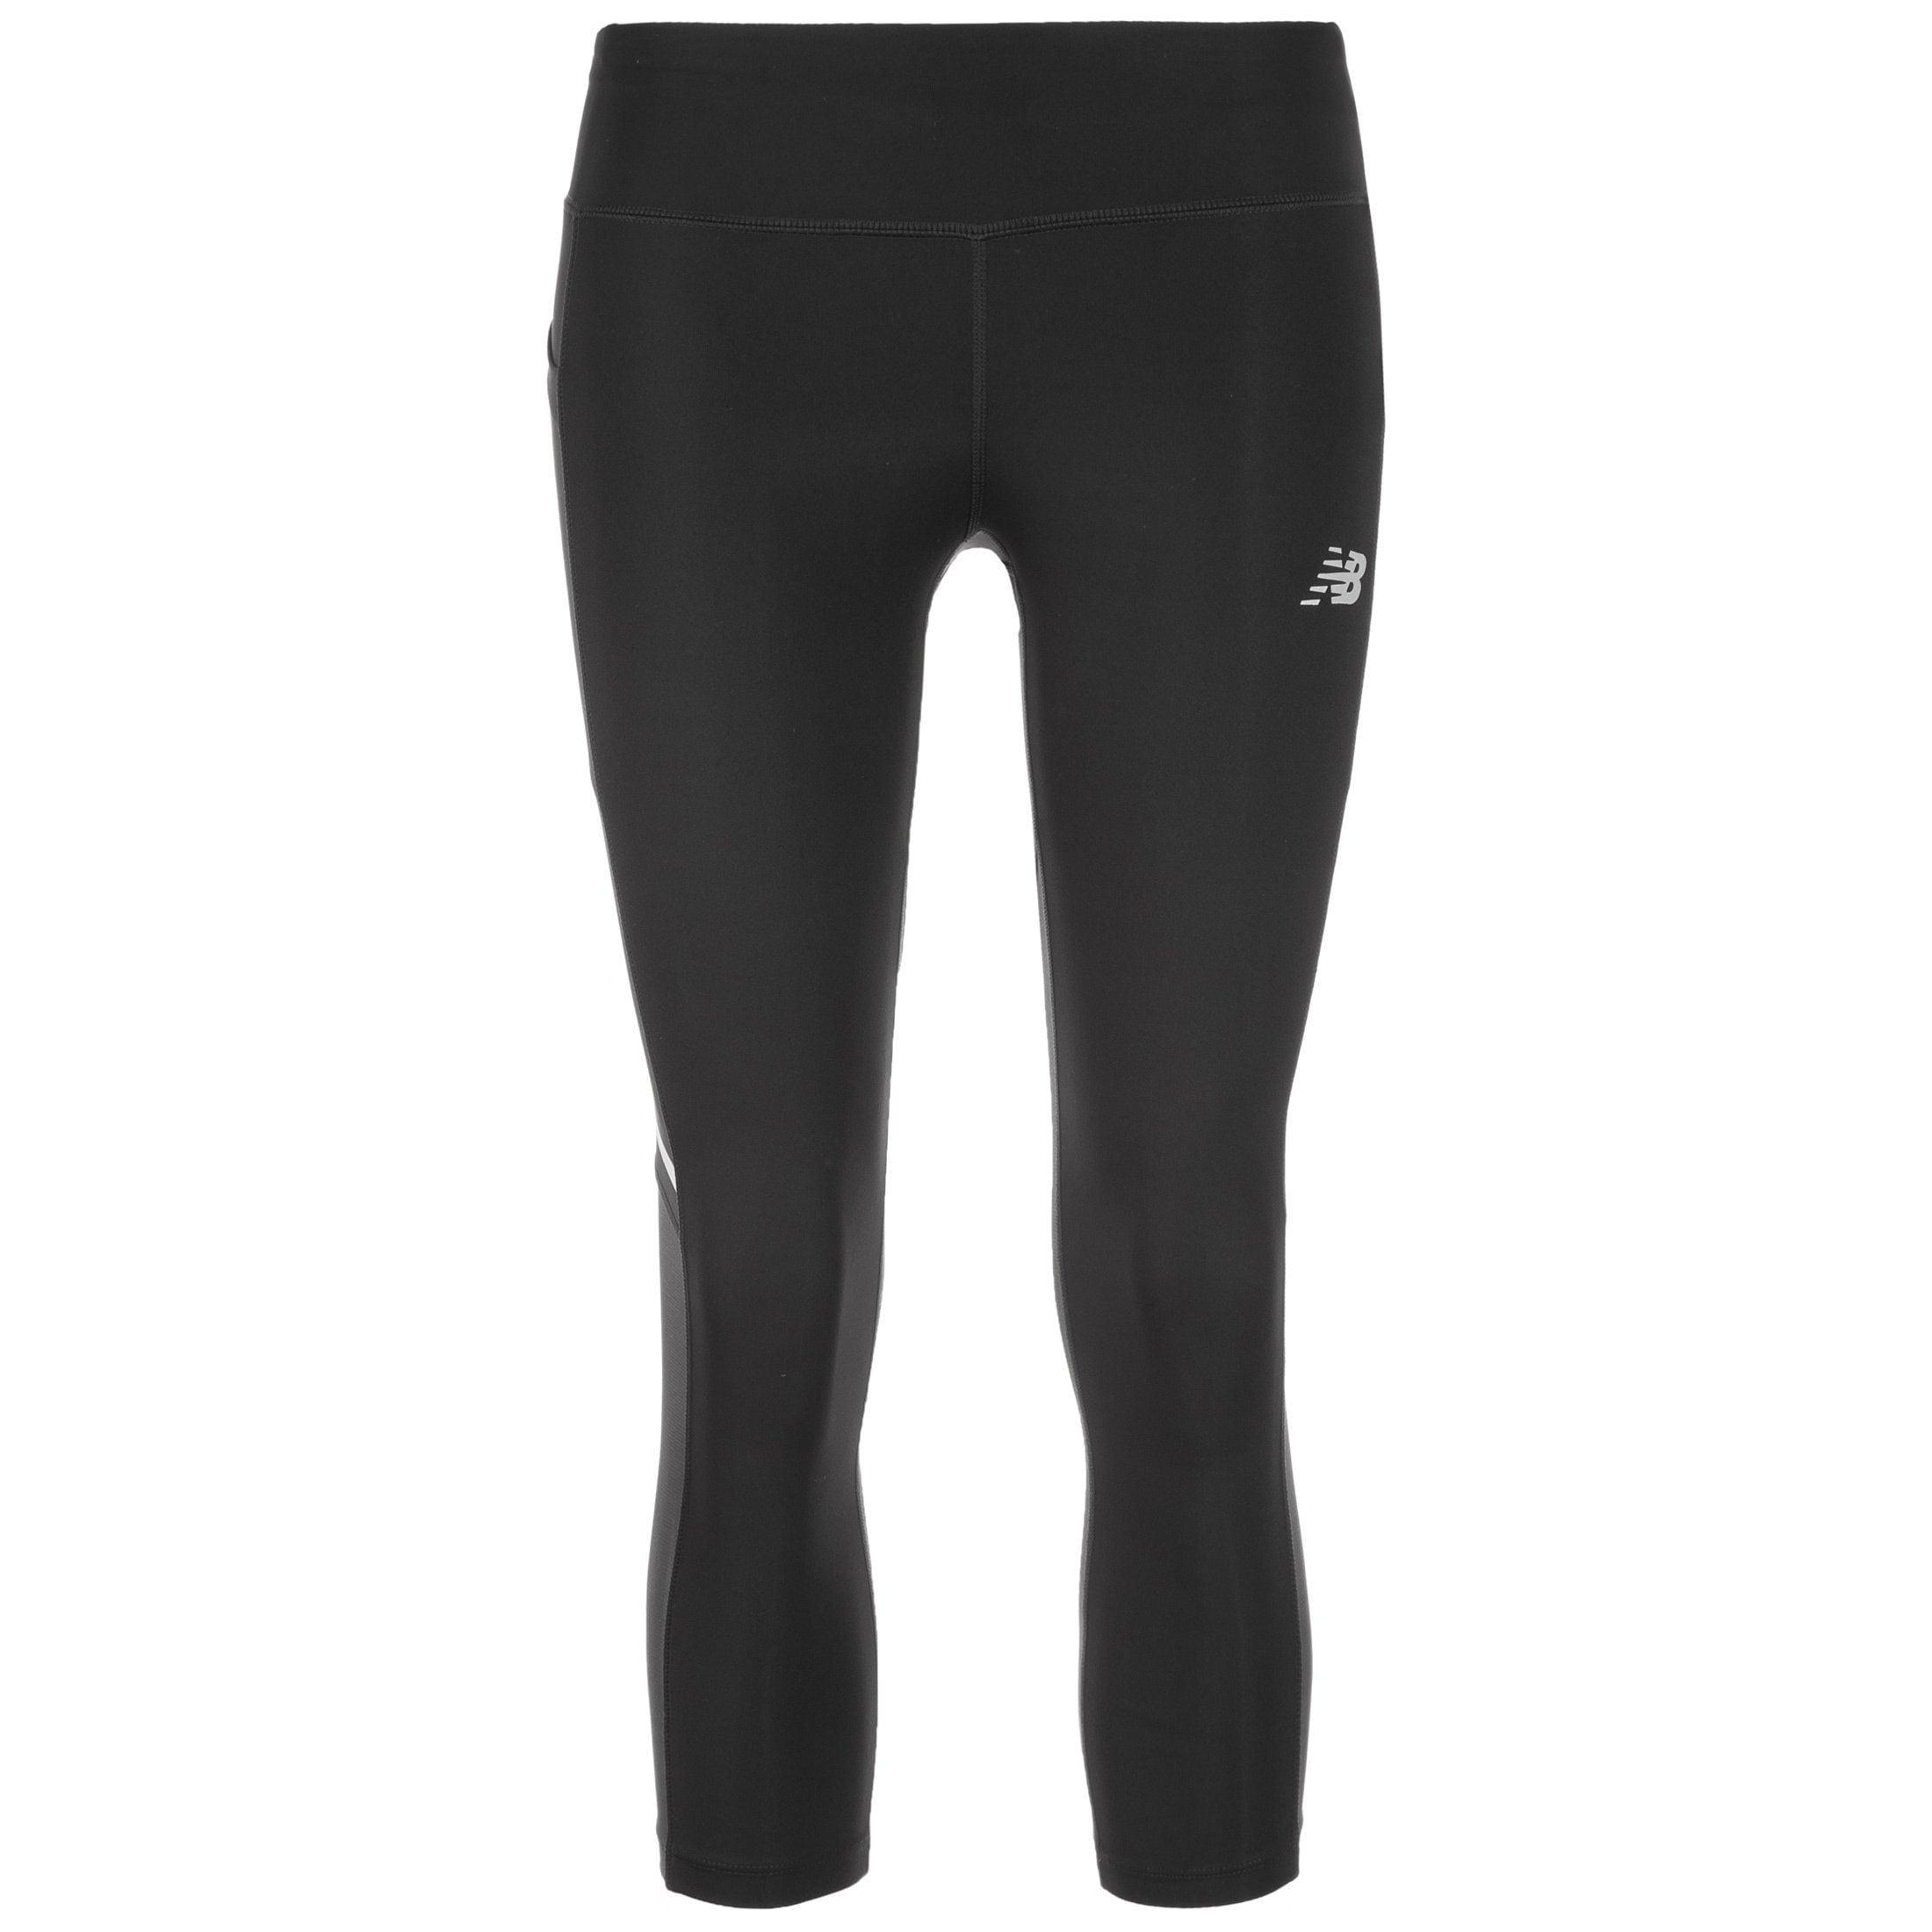 New Balance Lauftights Impact Capri   Sportbekleidung > Sporthosen > Tights   Schwarz   New Balance